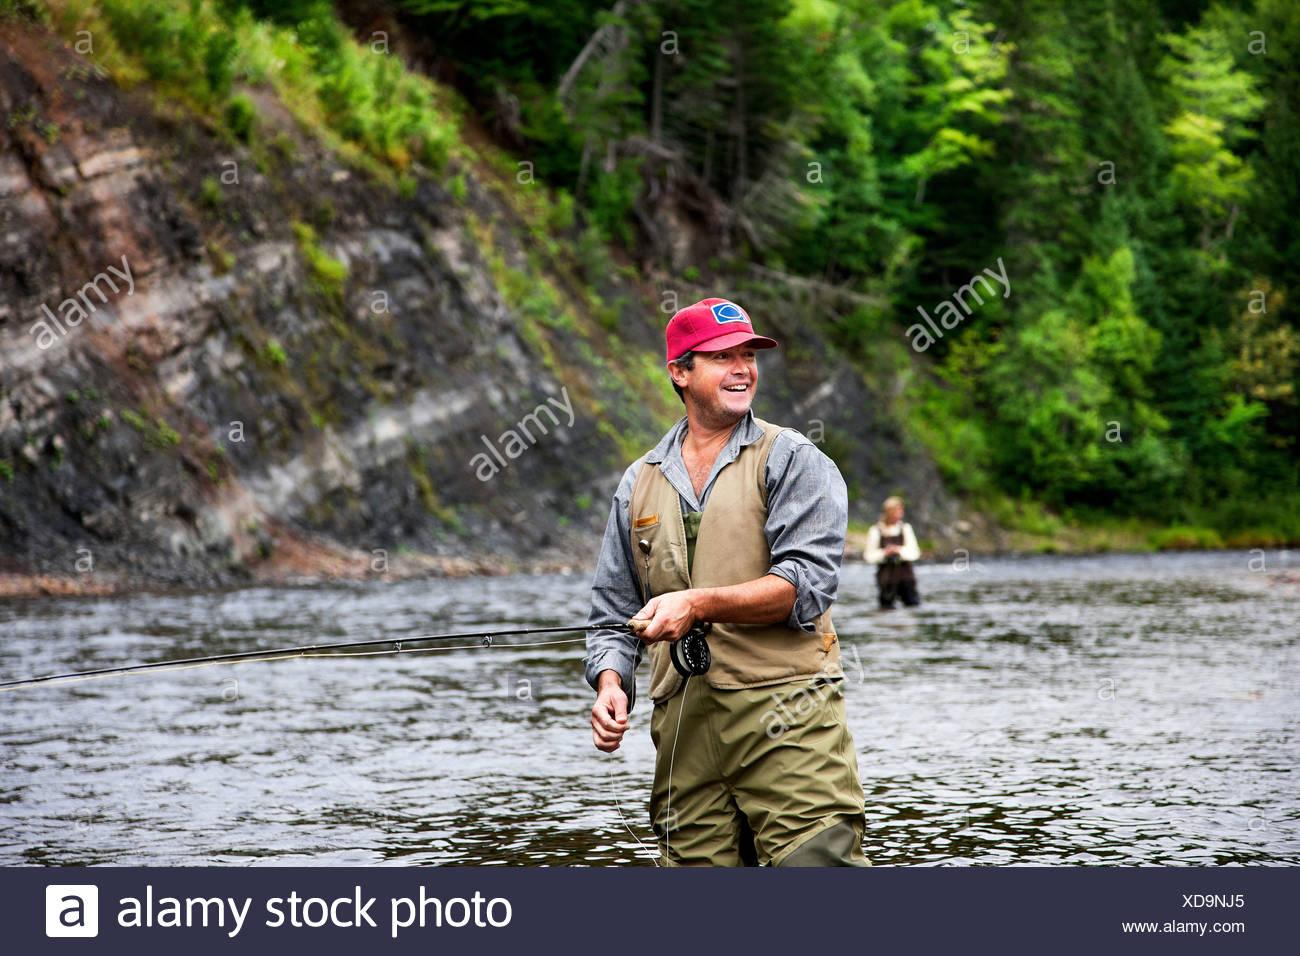 Fly fishers in Margaree River, Cape Breton Island, Nova Scotia - Stock Image